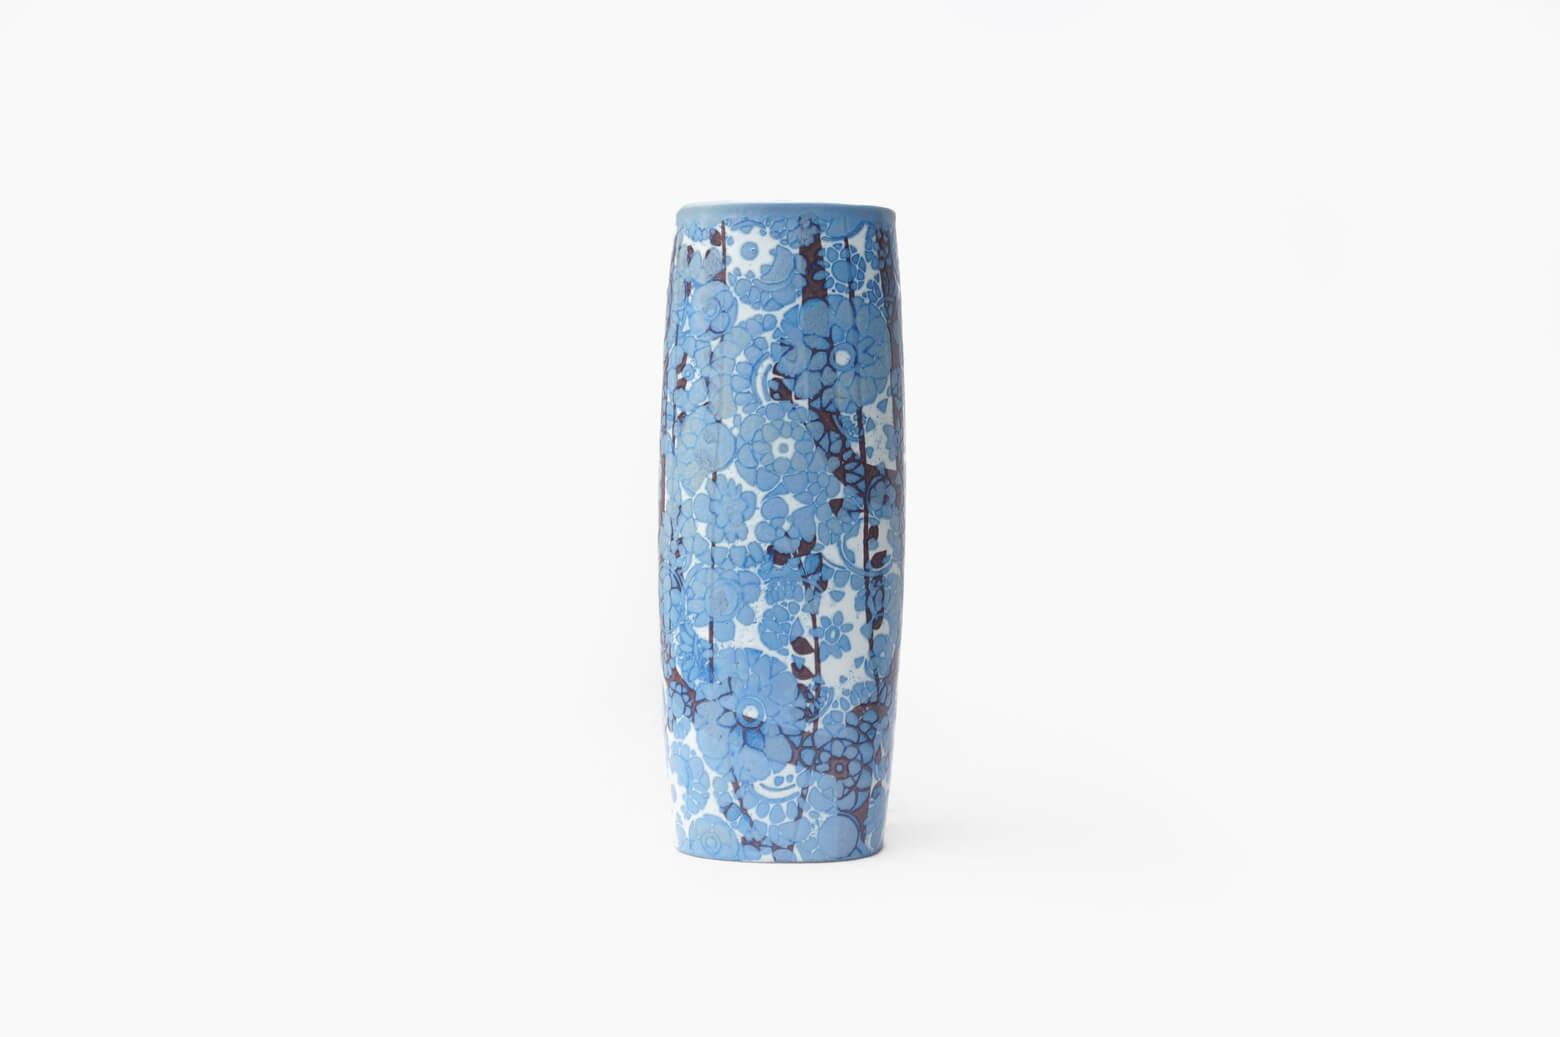 Royal Copenhagen Baca Flower Vase designed by Johanne Gerber/ロイヤルコペンハーゲン バッカ フラワーベース ヨハンネ・ゲーバー